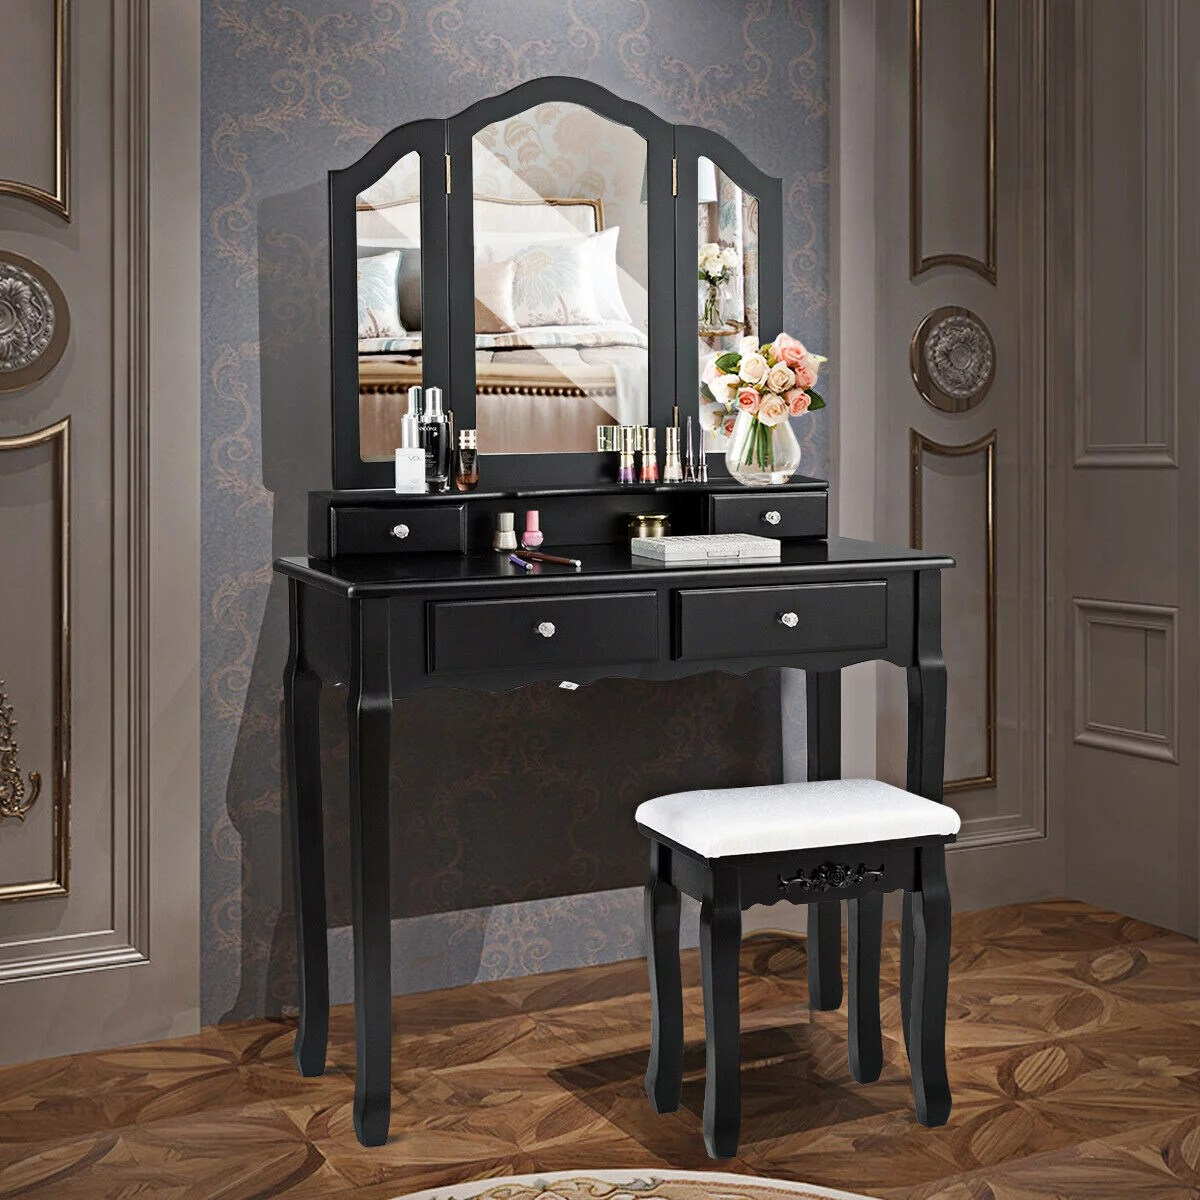 gymax bedroom tri folding mirror vanity makeup table stool set black